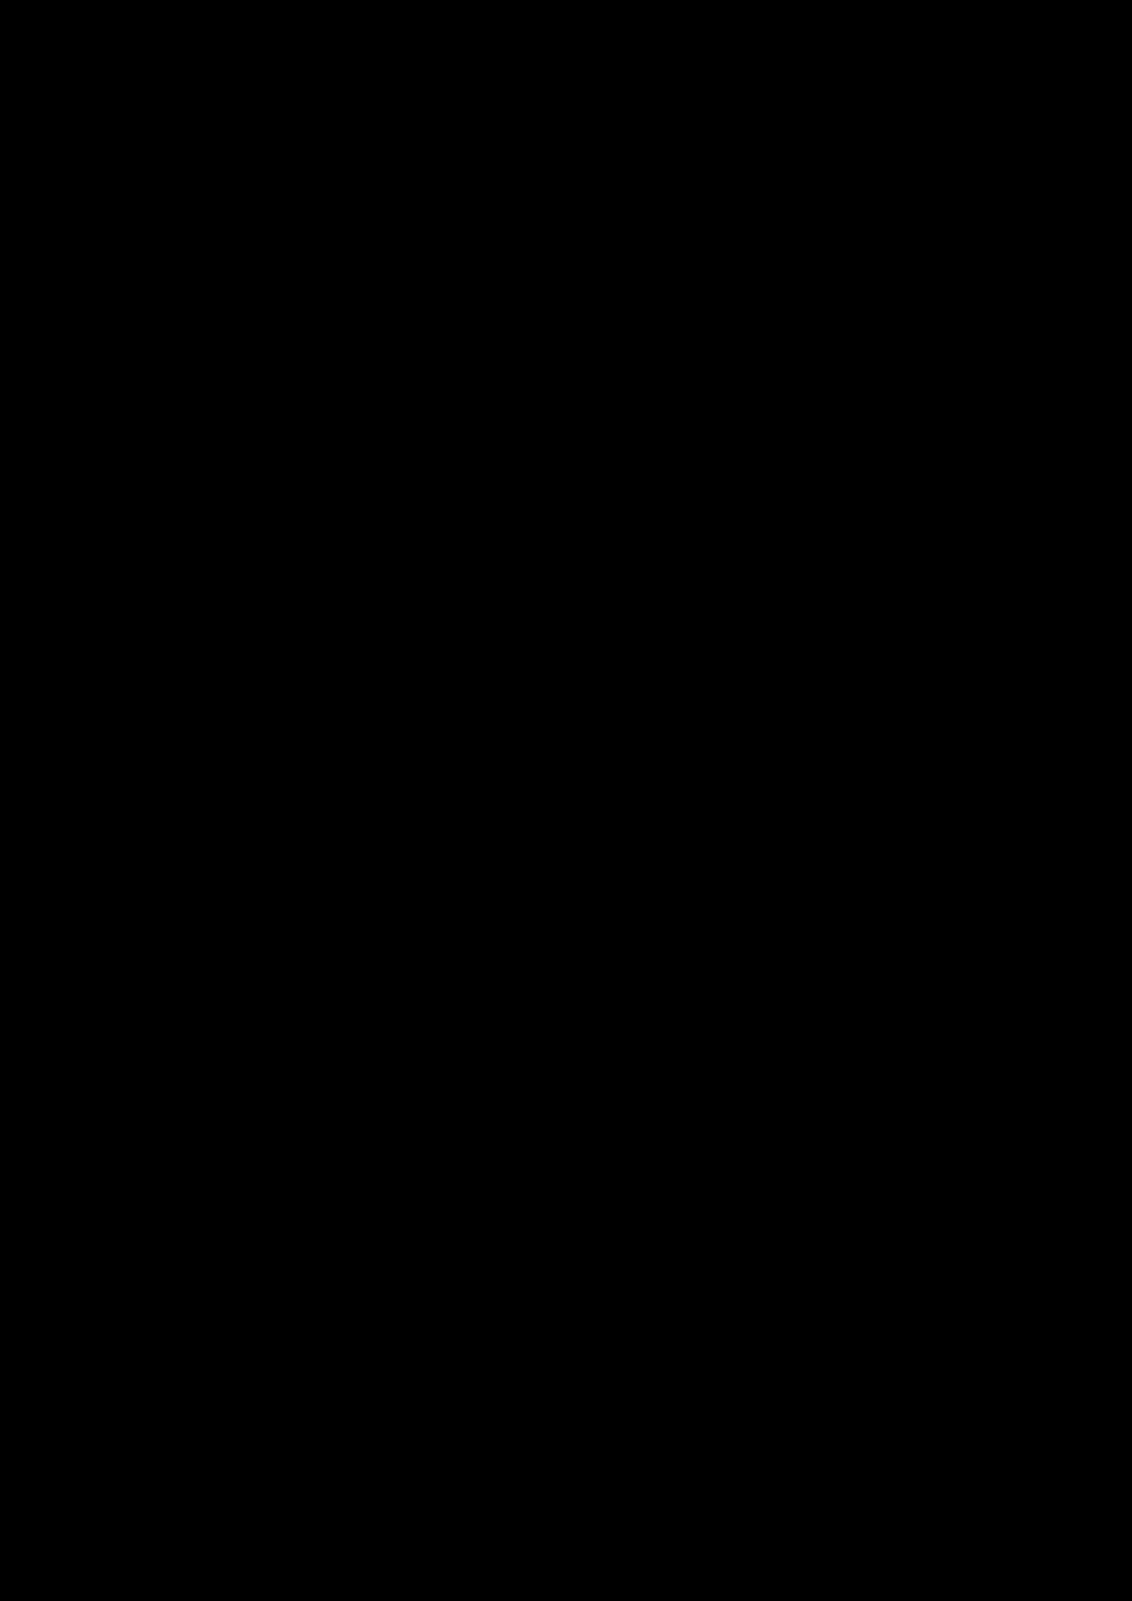 Mrs. Vandebilt slide, Image 36